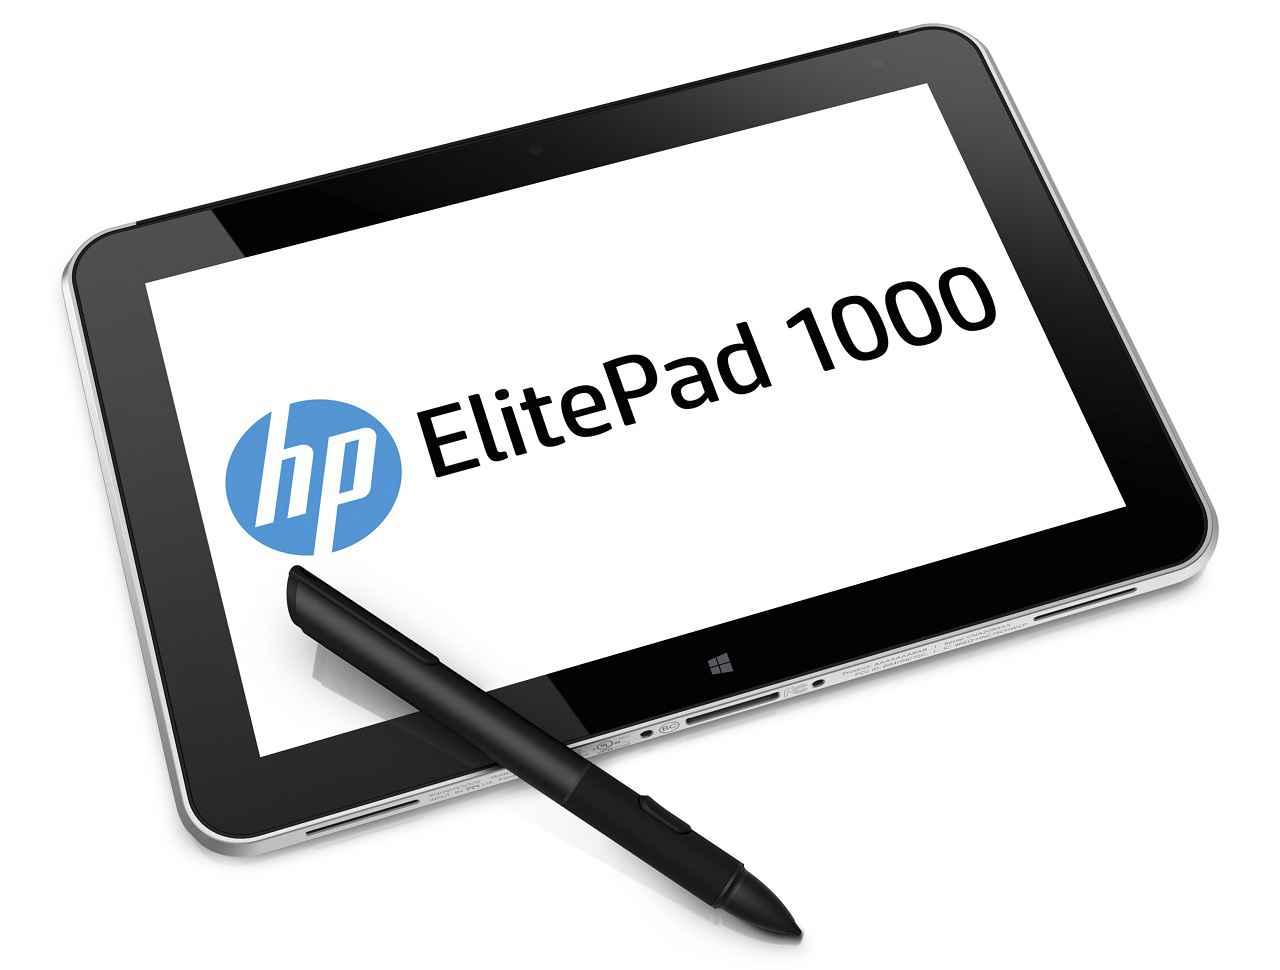 HP-ElitePad-1000 brasil 2014